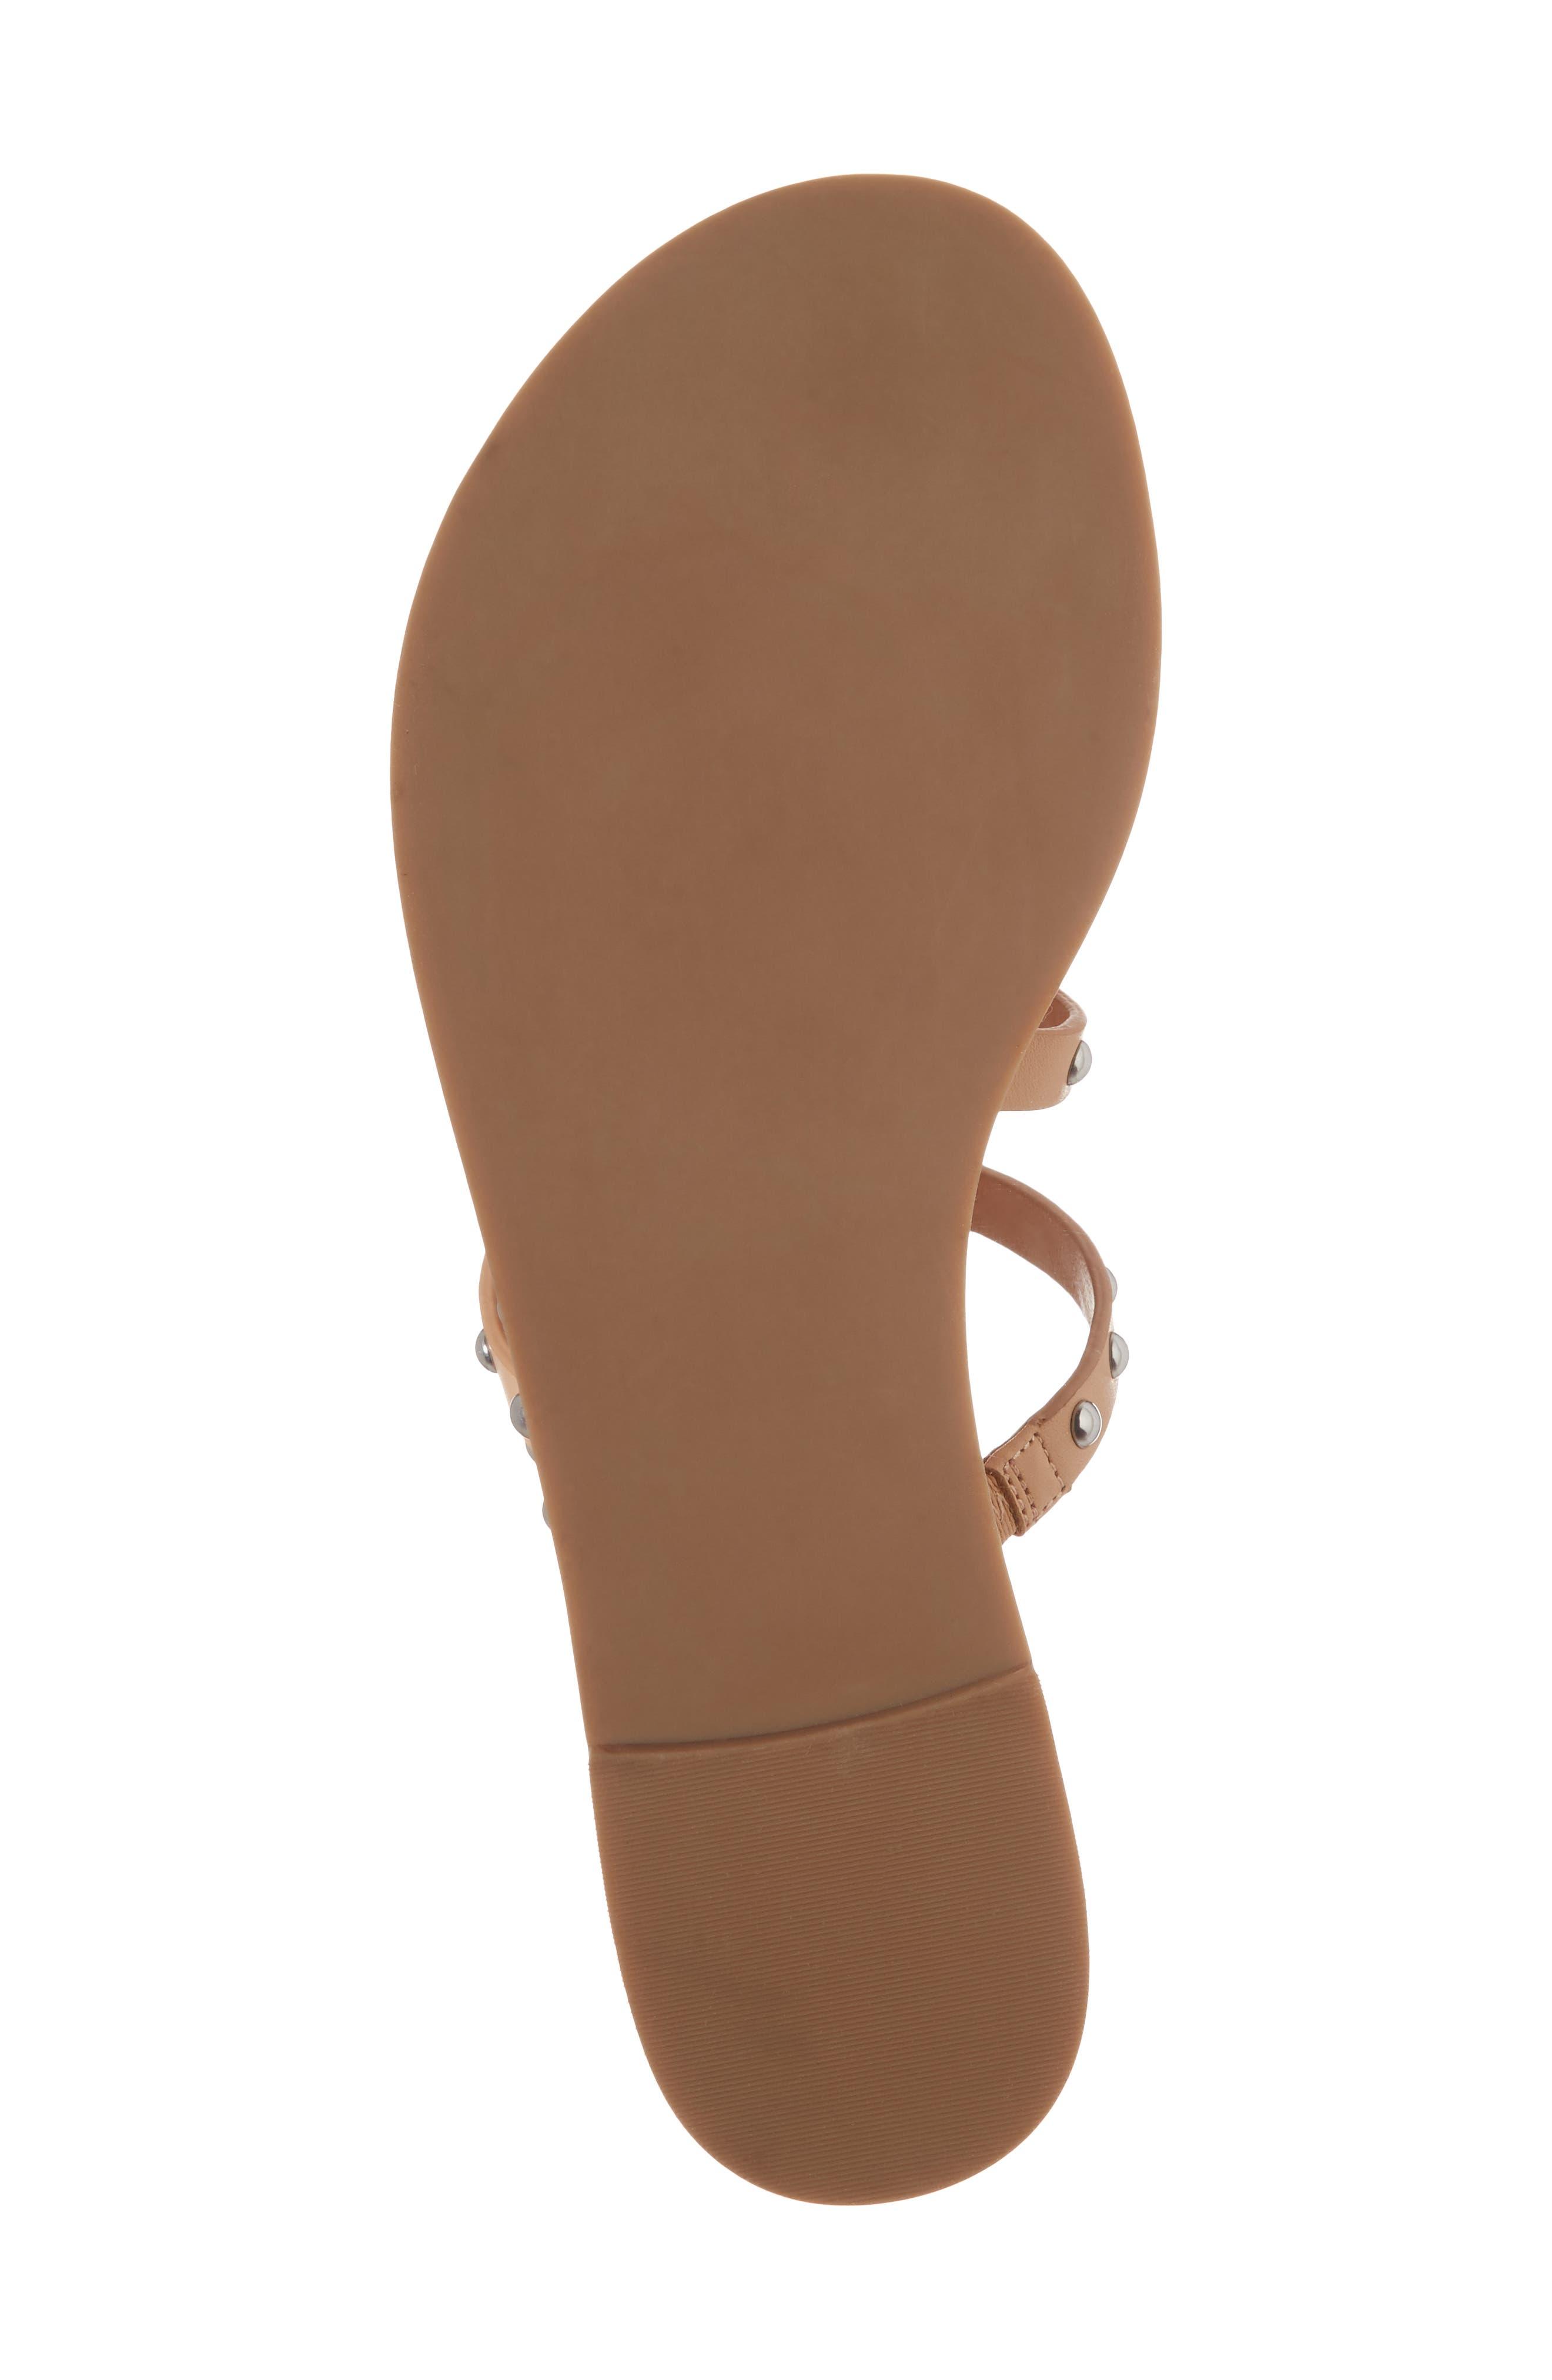 Patos Studded Thong Sandal,                             Alternate thumbnail 6, color,                             NATURAL VACHETTA